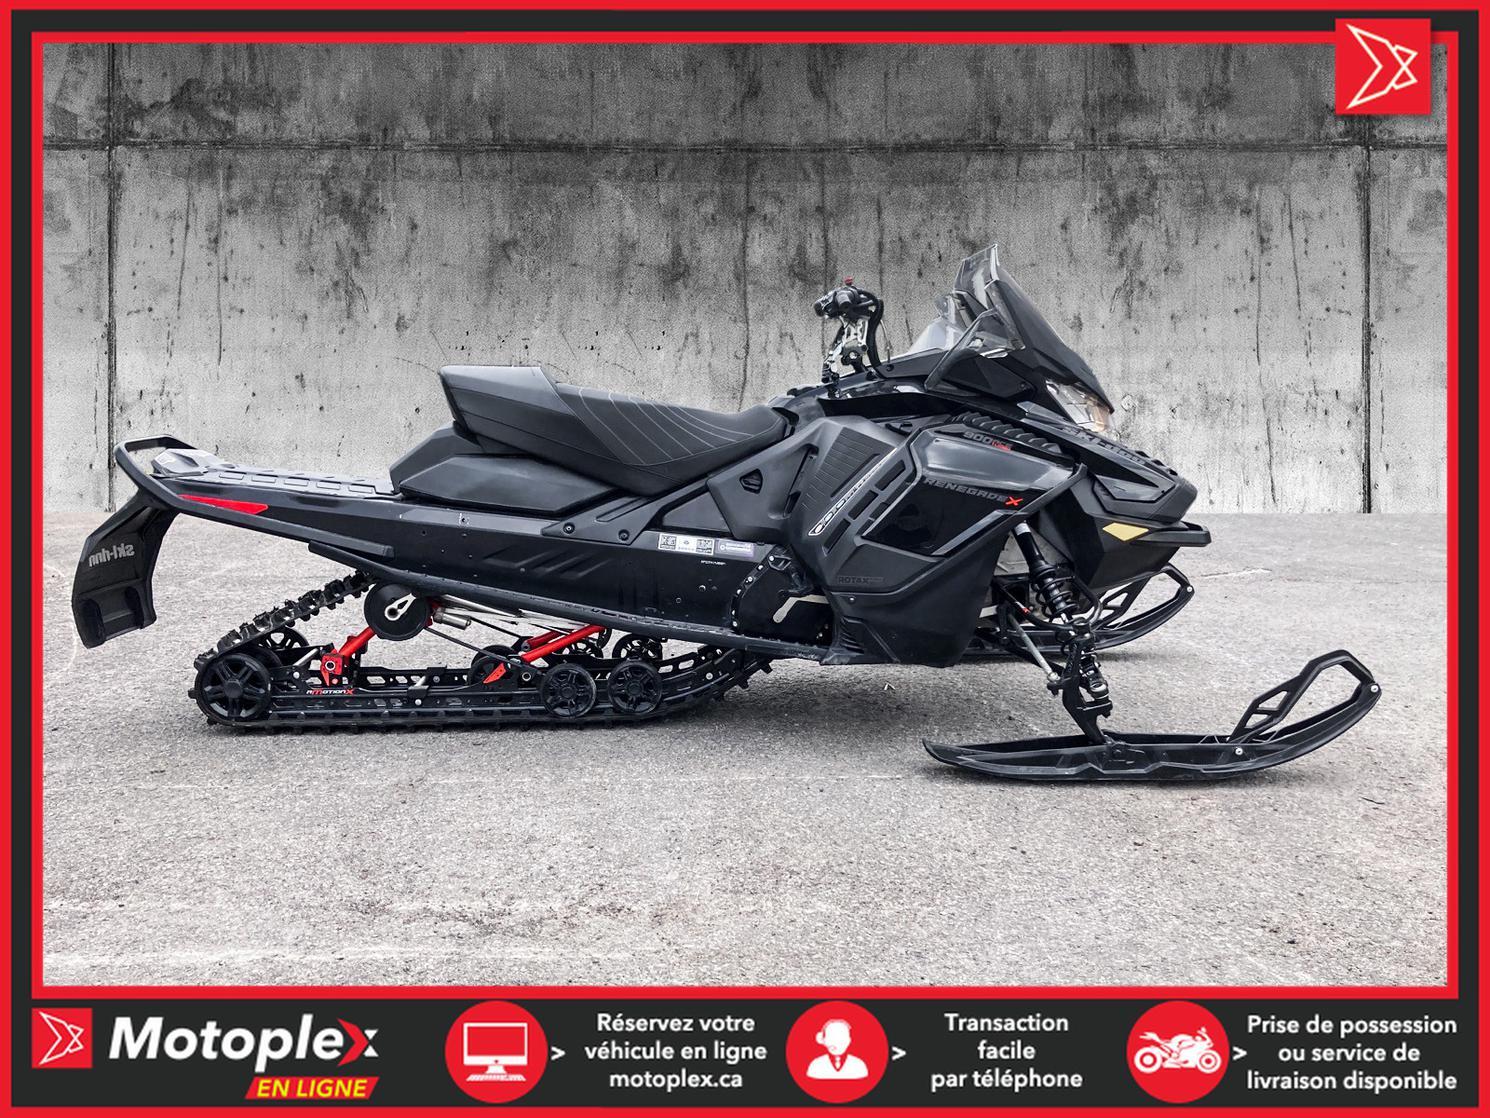 2021 Ski-Doo RENEGADE X 900 ACE TURBO - 57$/SEMAINE